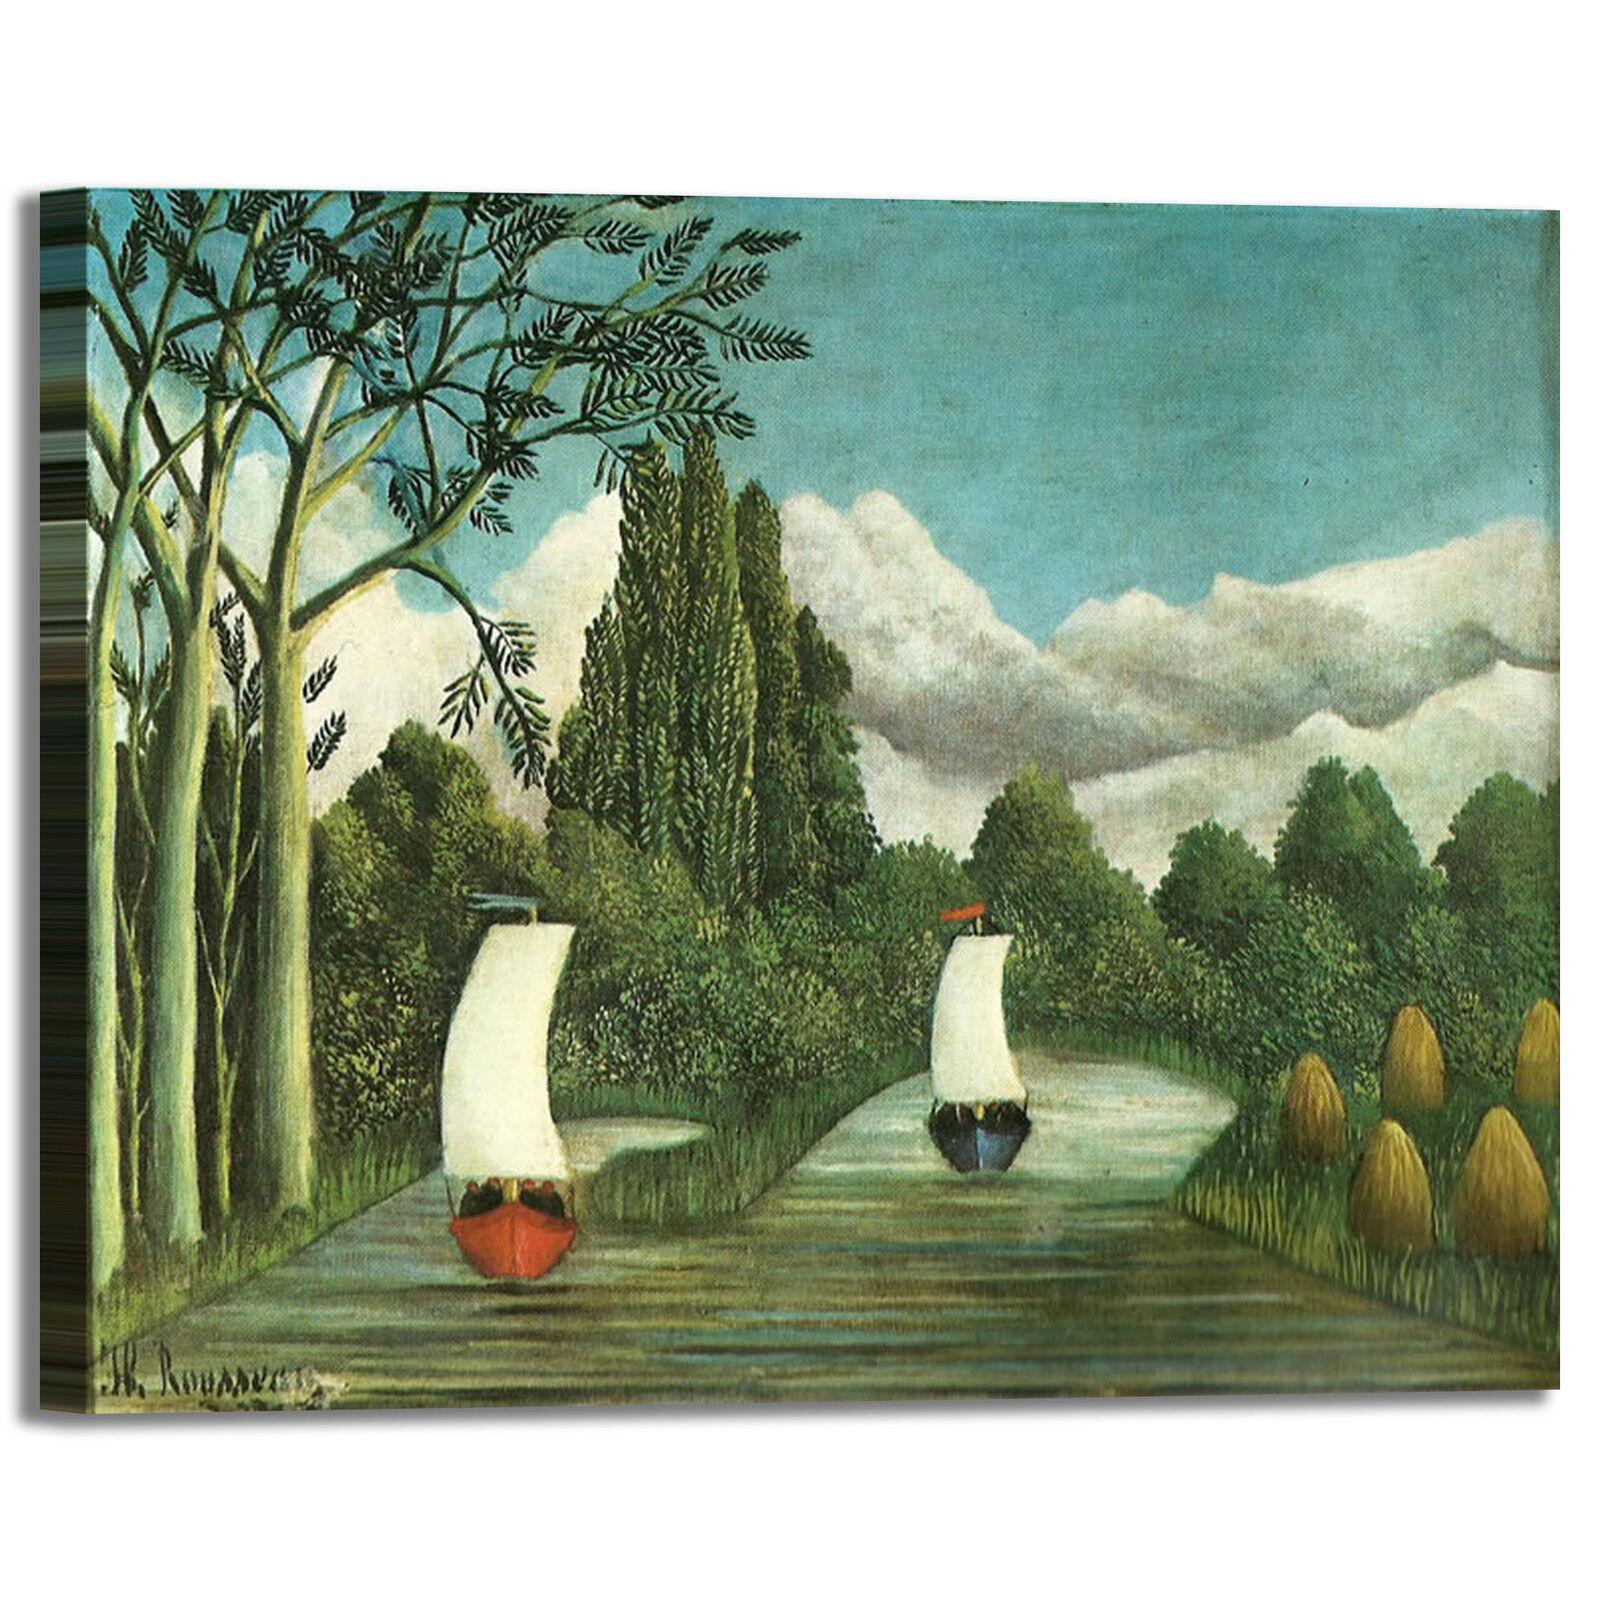 Rousseau barche a vela design quadro stampa tela dipinto telaio arroto casa